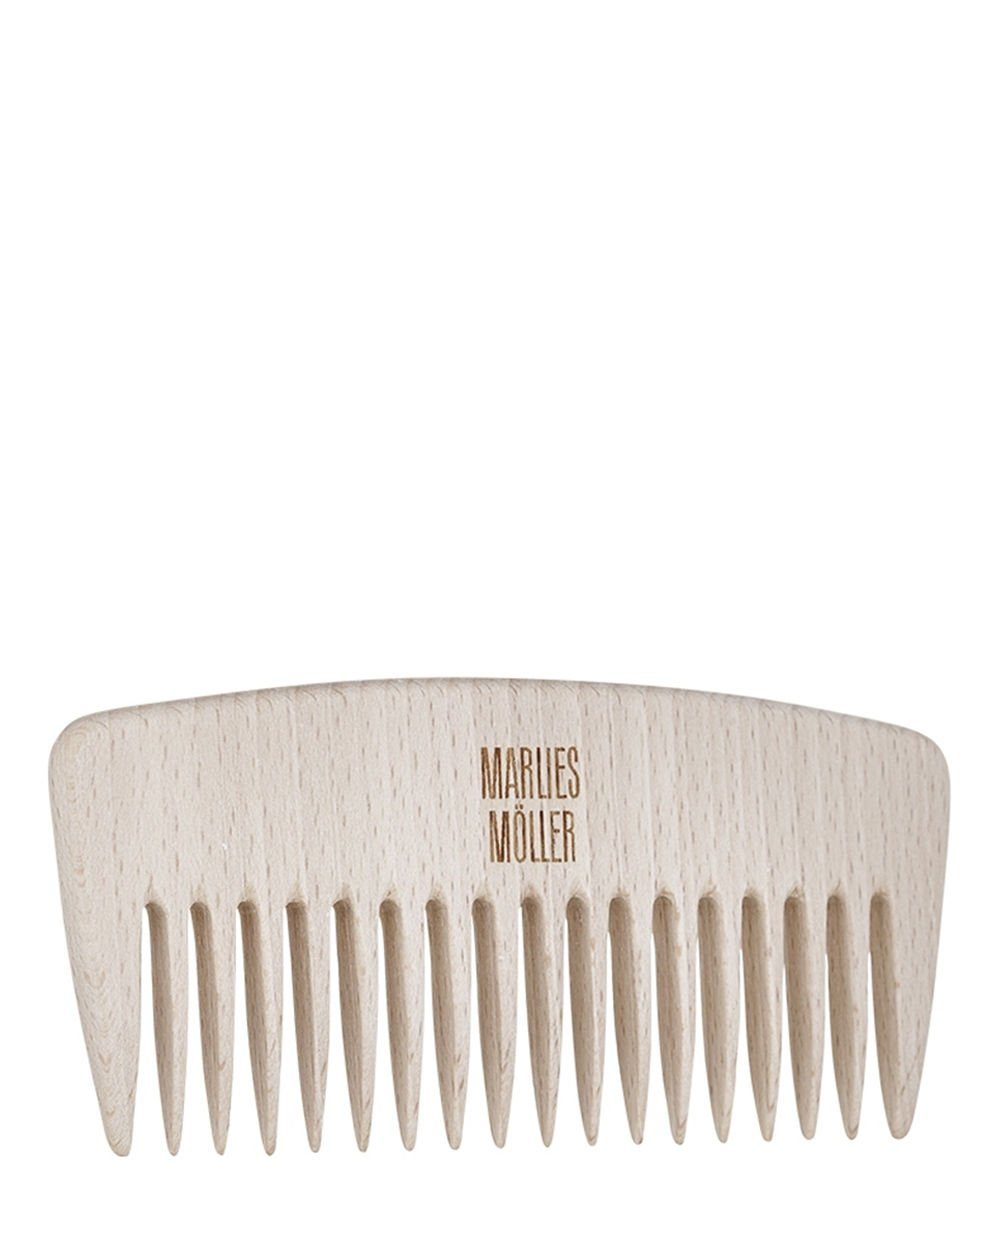 Marlies Möller Haarkamm »Allround Comb«